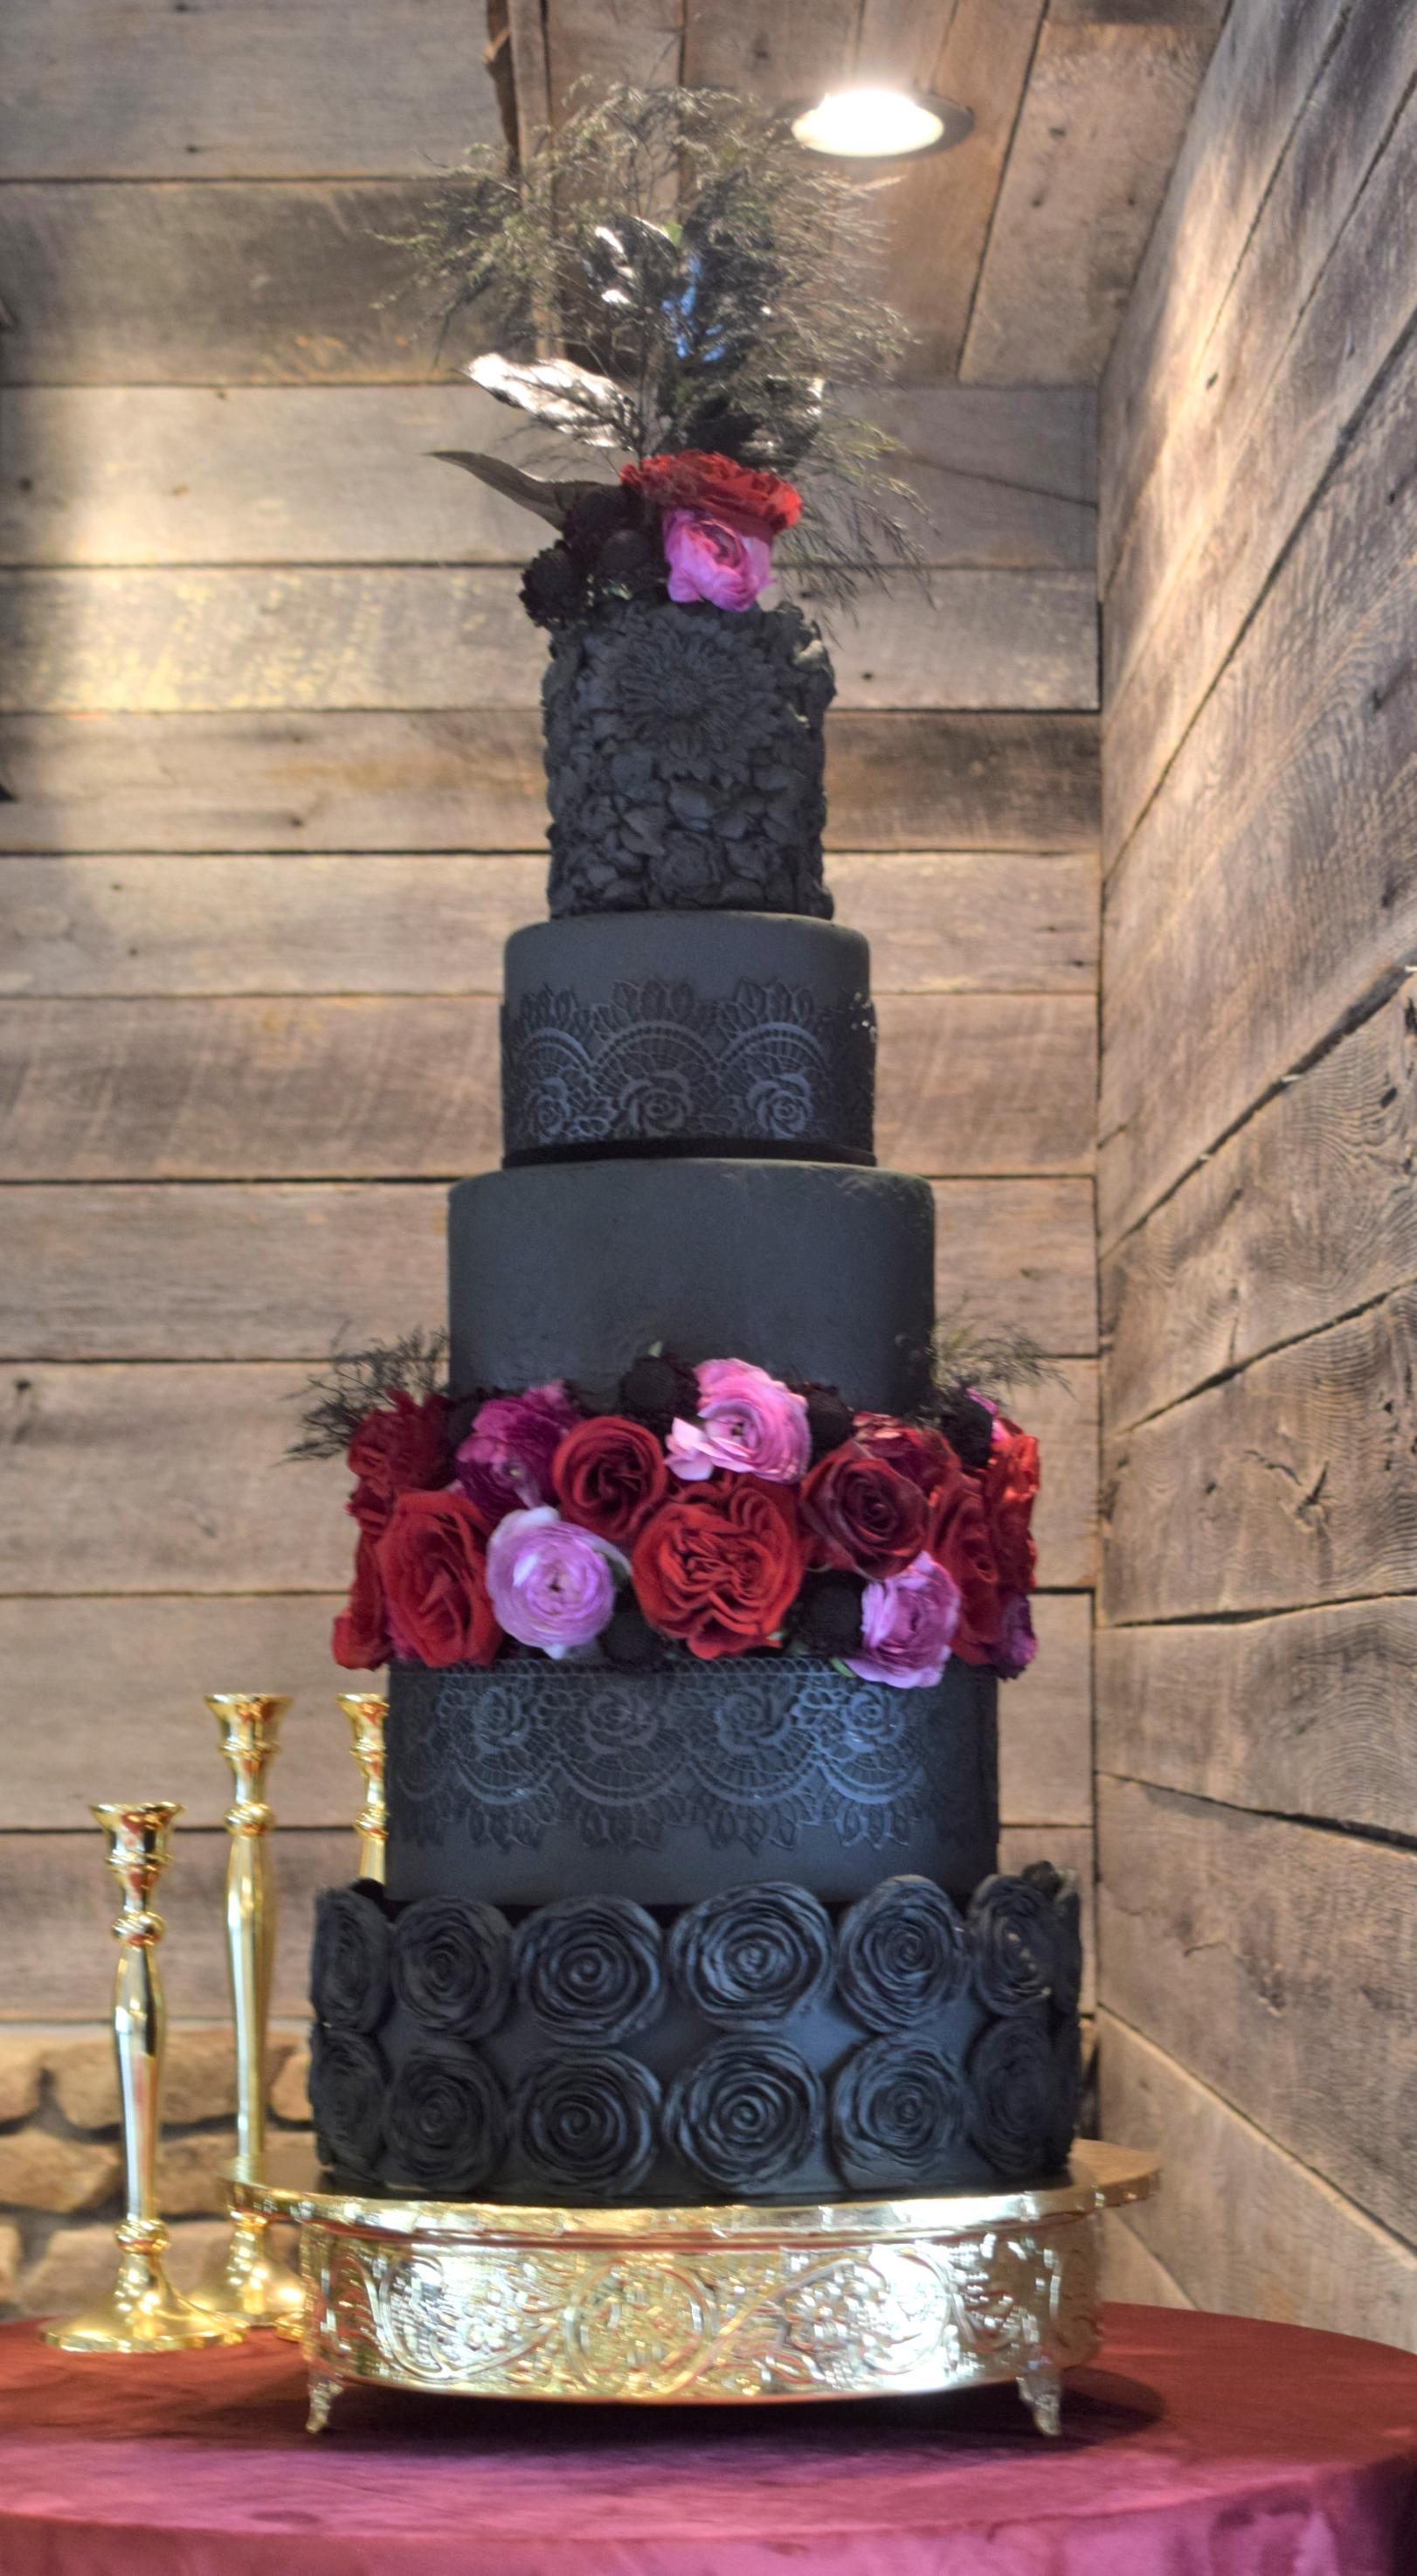 Moody/Romantic Wedding Cake